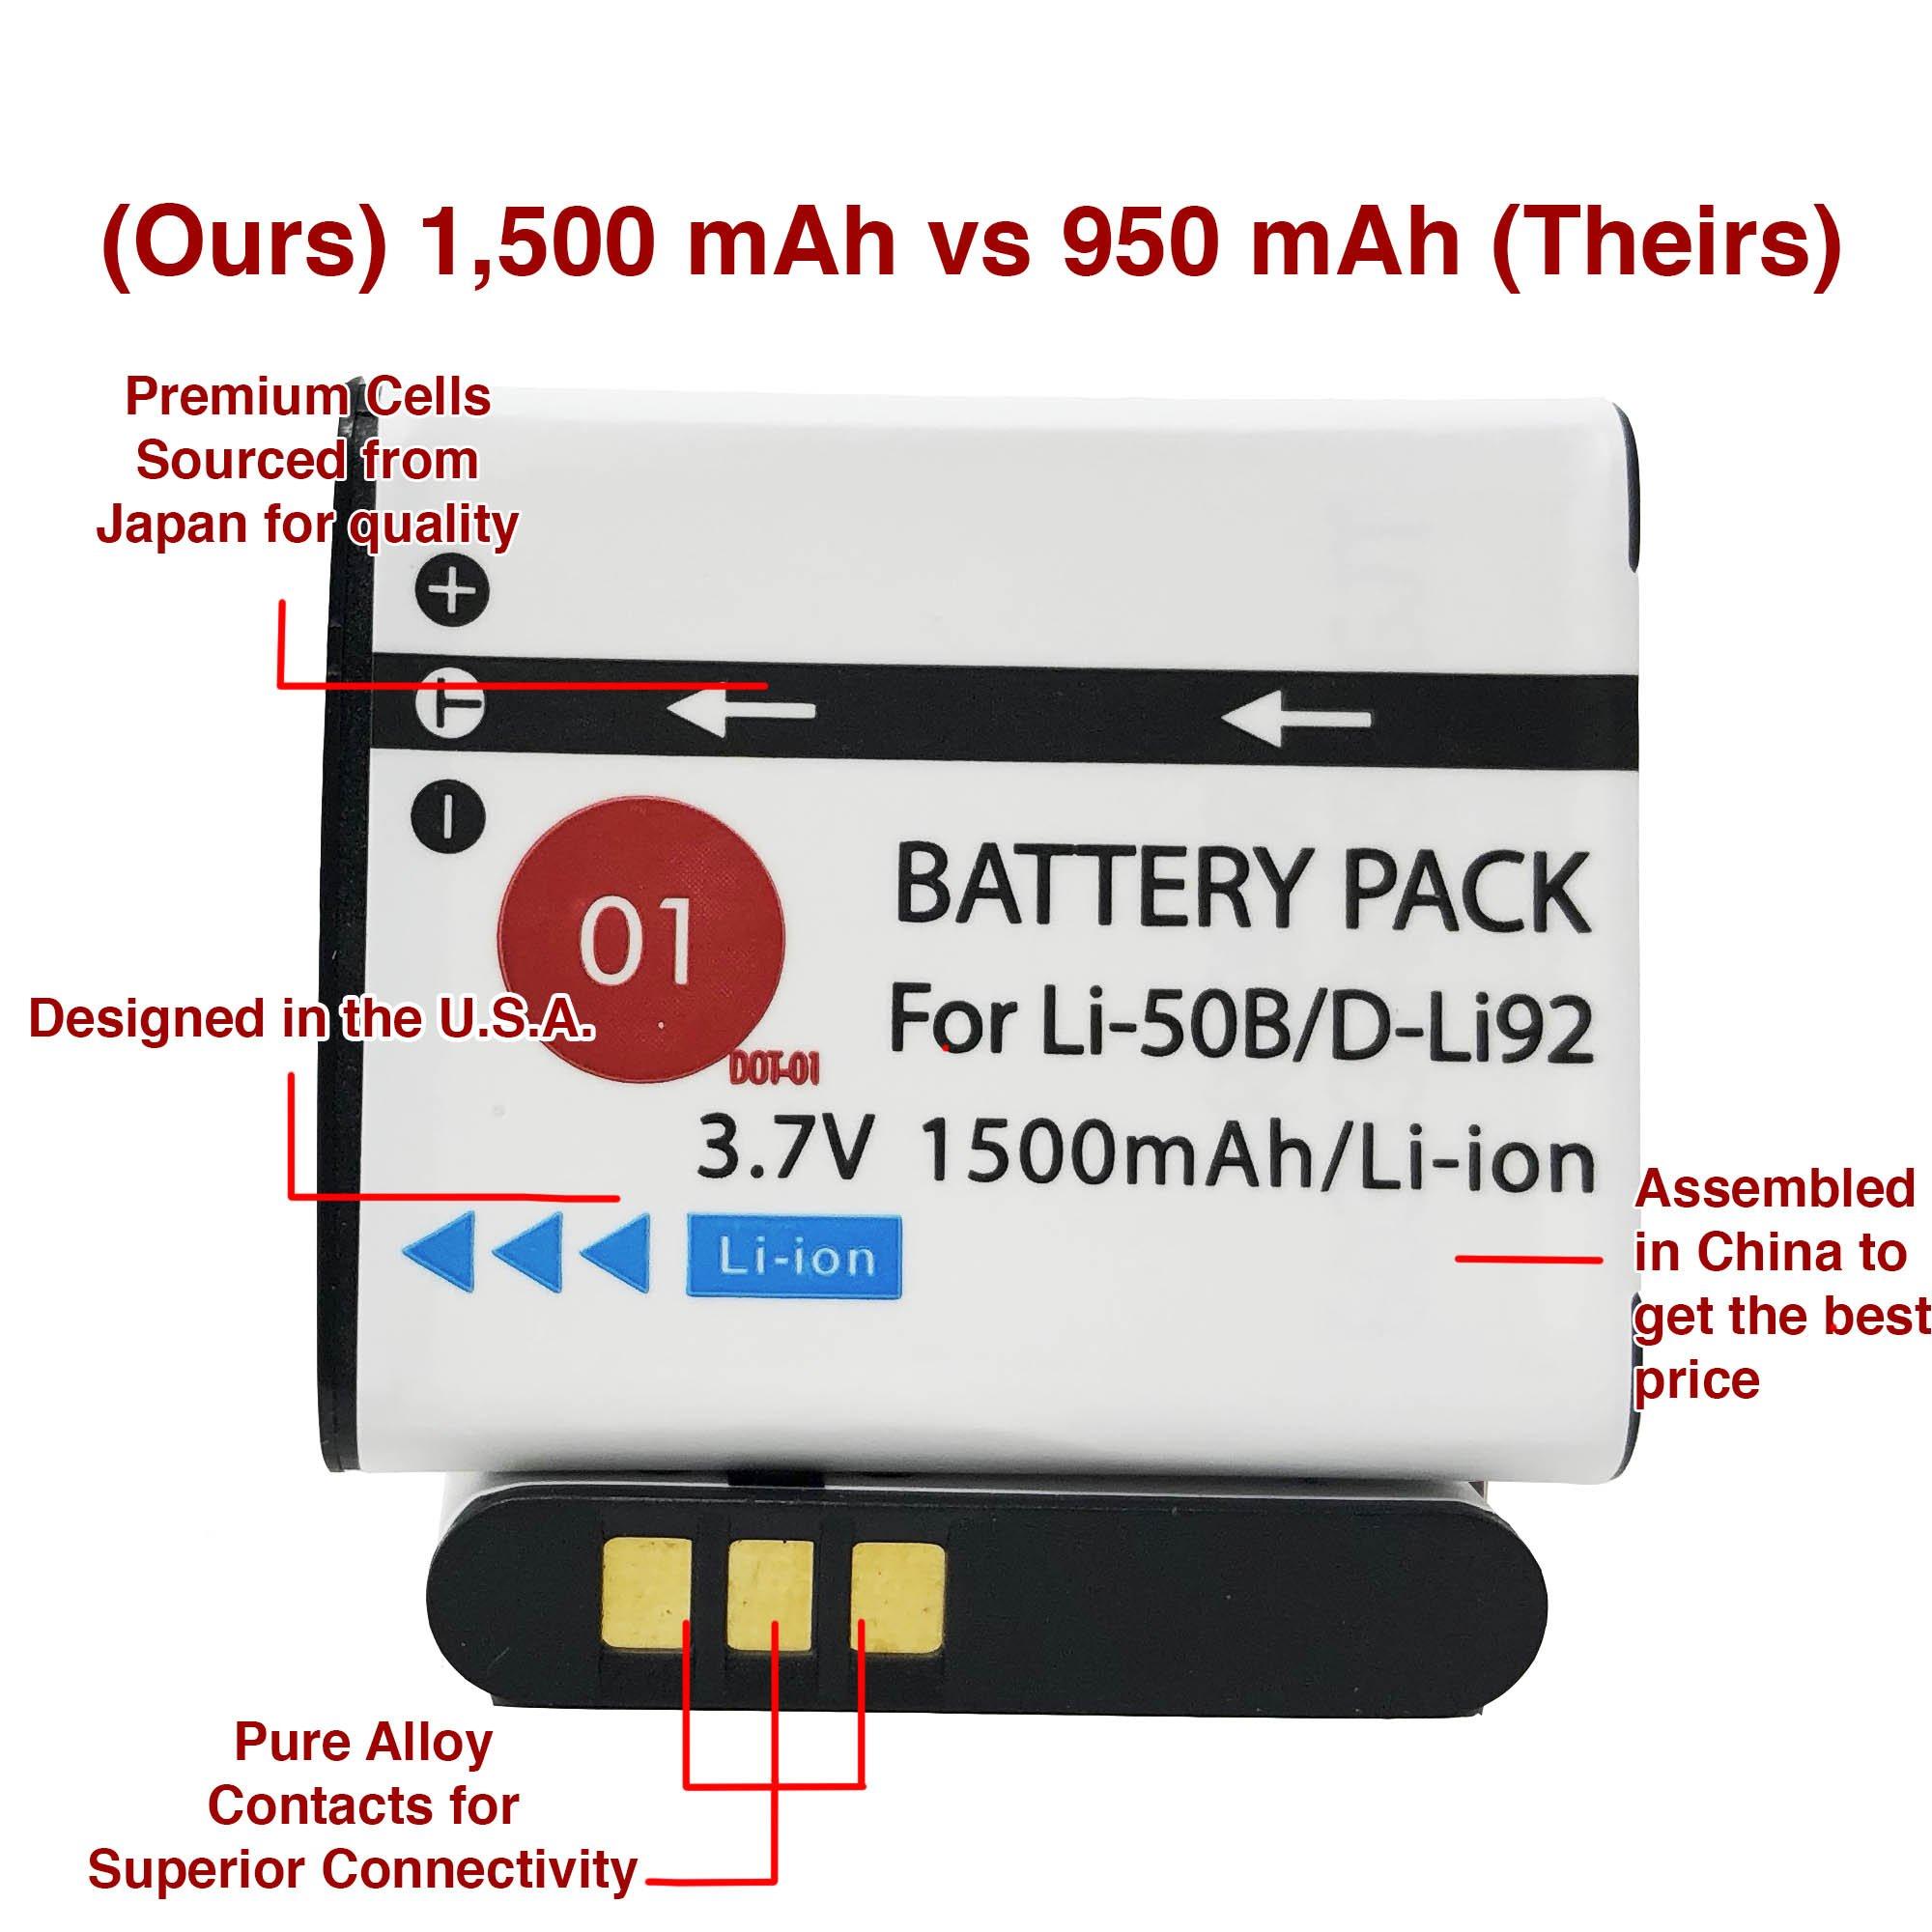 DOT-01 4X Brand 1500 mAh Replacement Olympus LI-50B Batteries and Dual Slot USB Charger for Olympus TG-860 Digital Camera and Olympus LI50B by DOT-01 (Image #2)